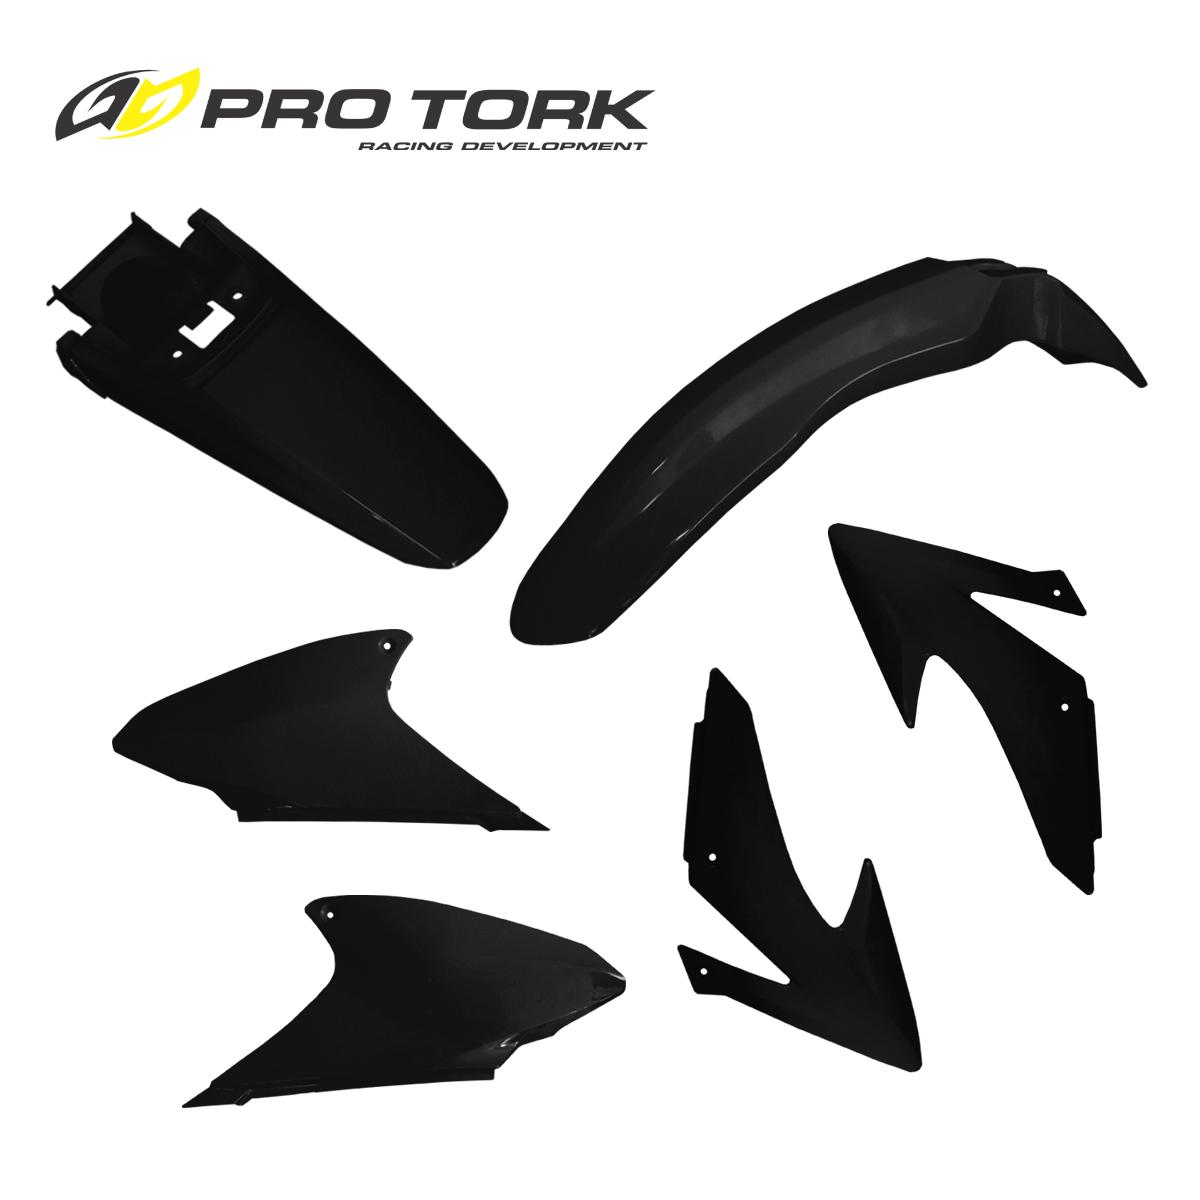 kit plasticos honda crf 230 pro tork negro